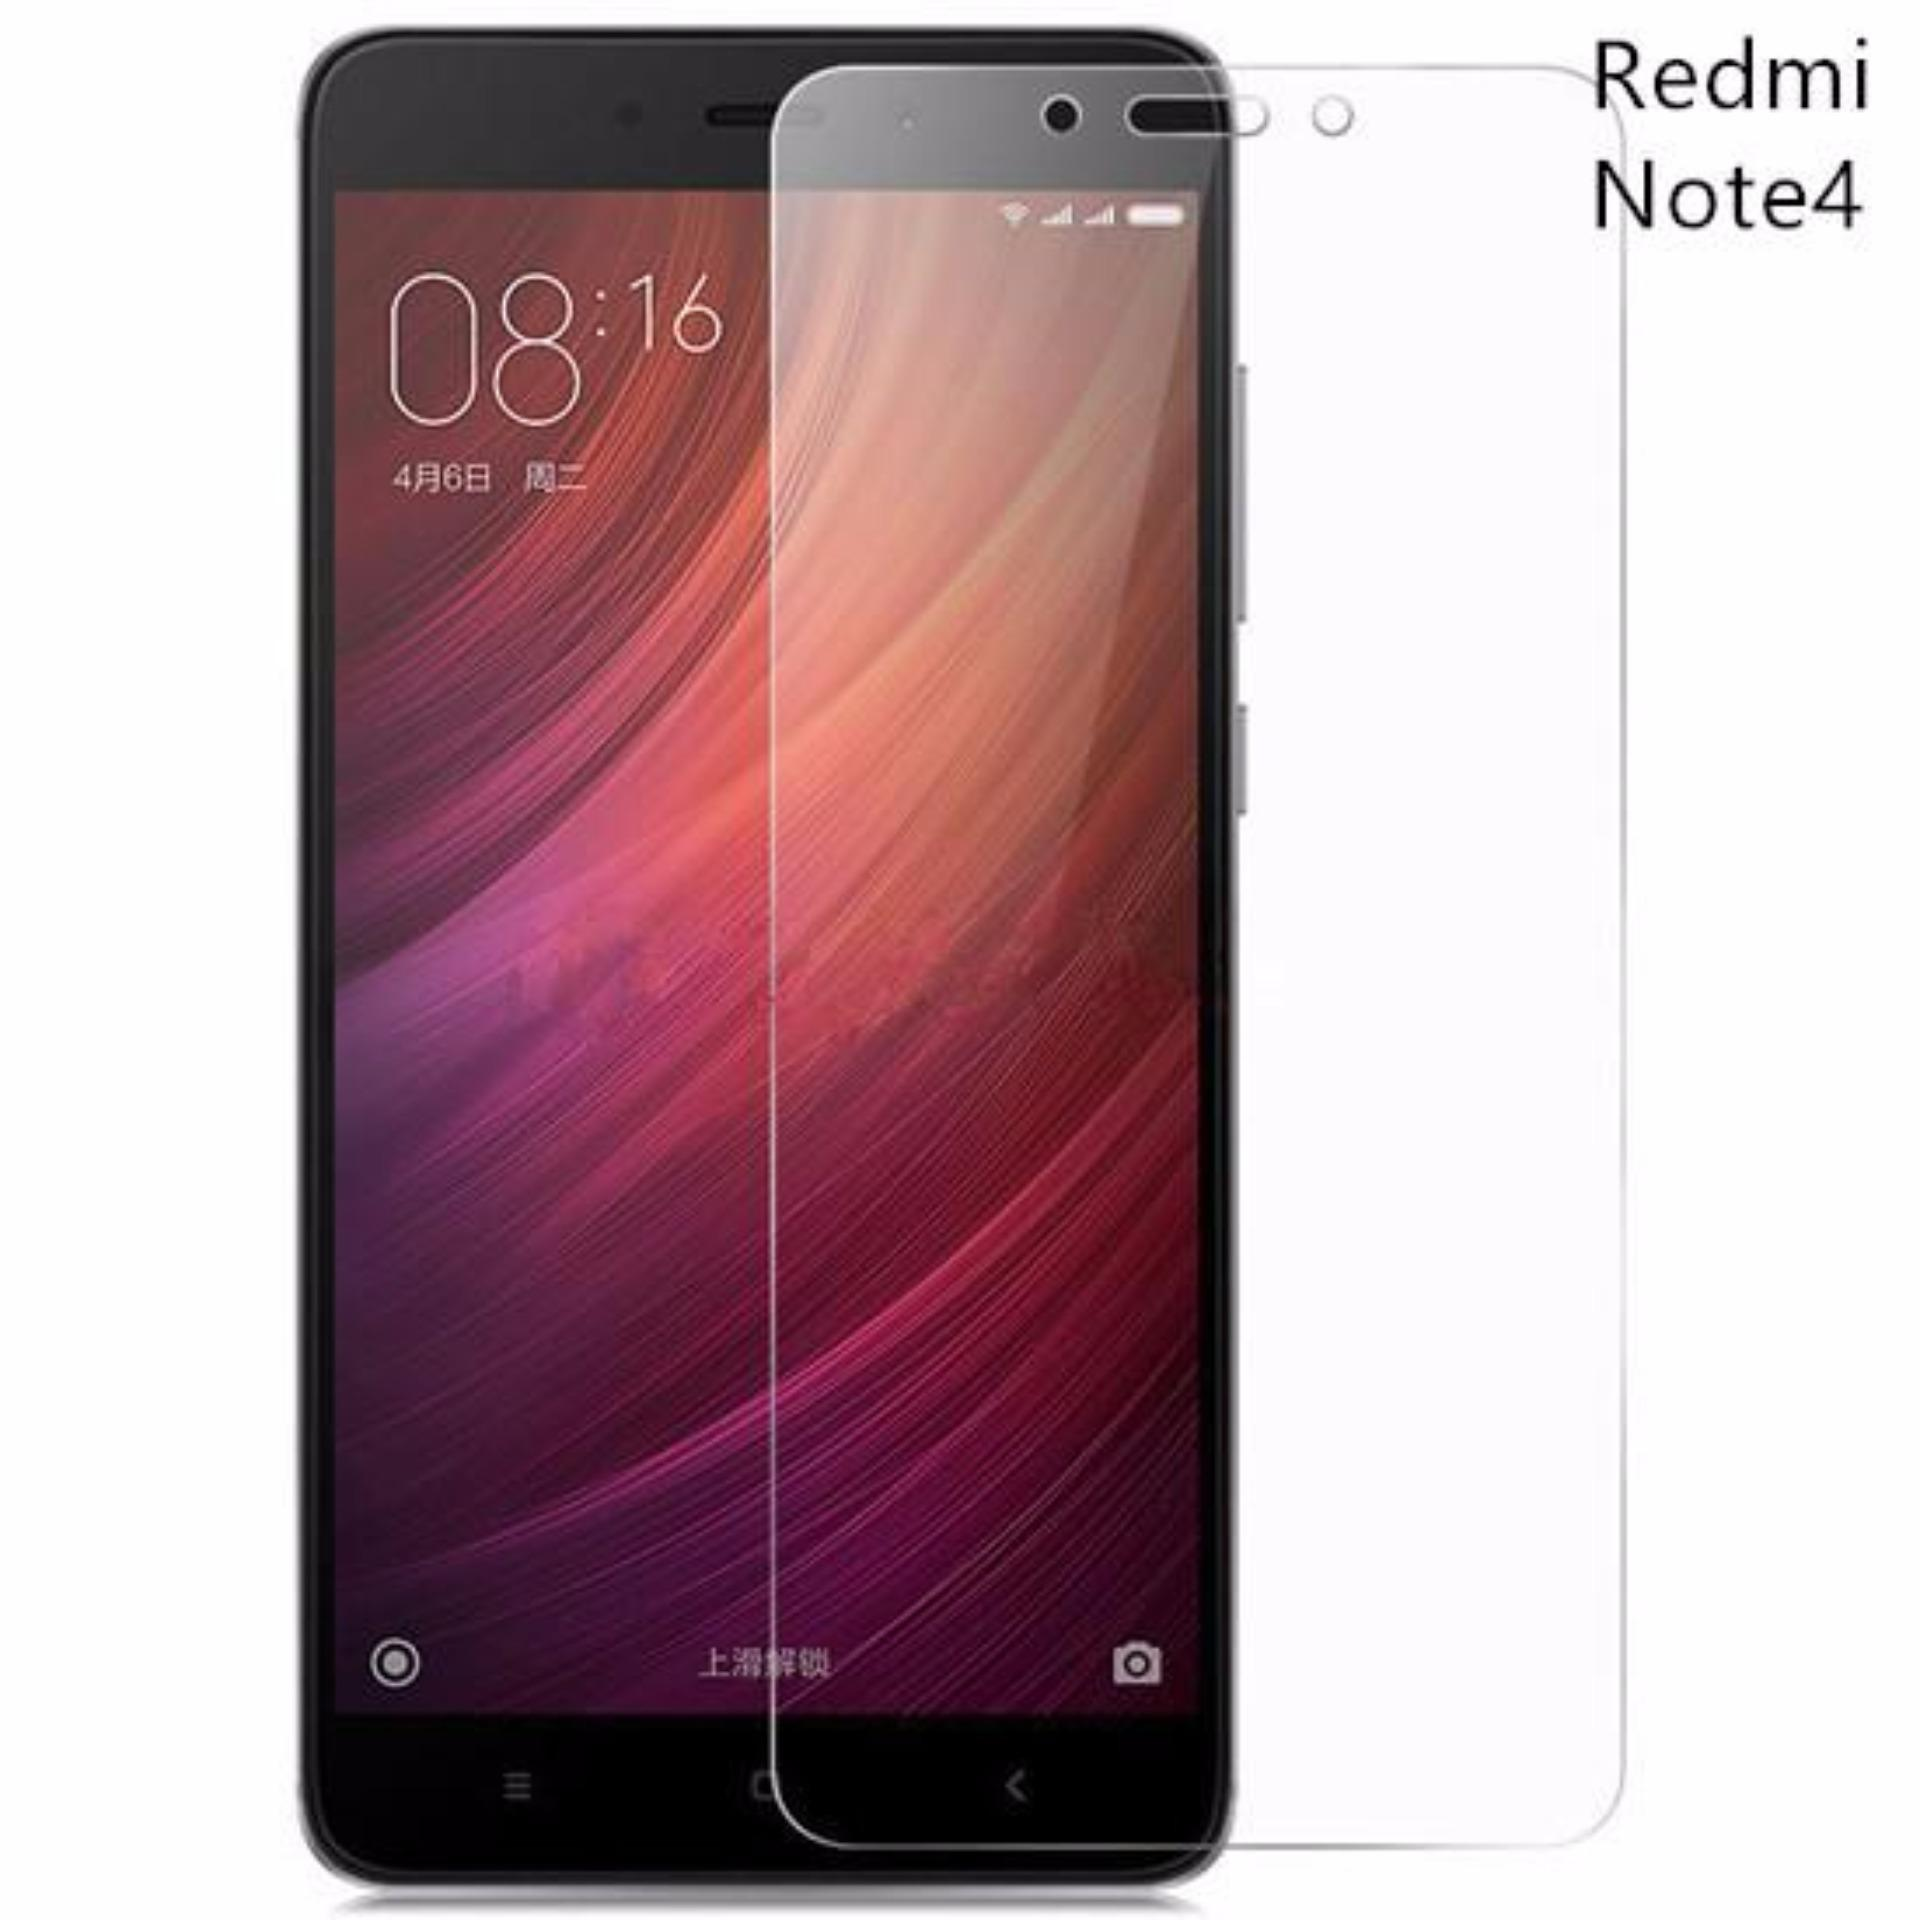 Tempered Glass Xiaomi Redmi Note 4 Anti Gores Kaca / Screen Protector / Pelindung Layar .